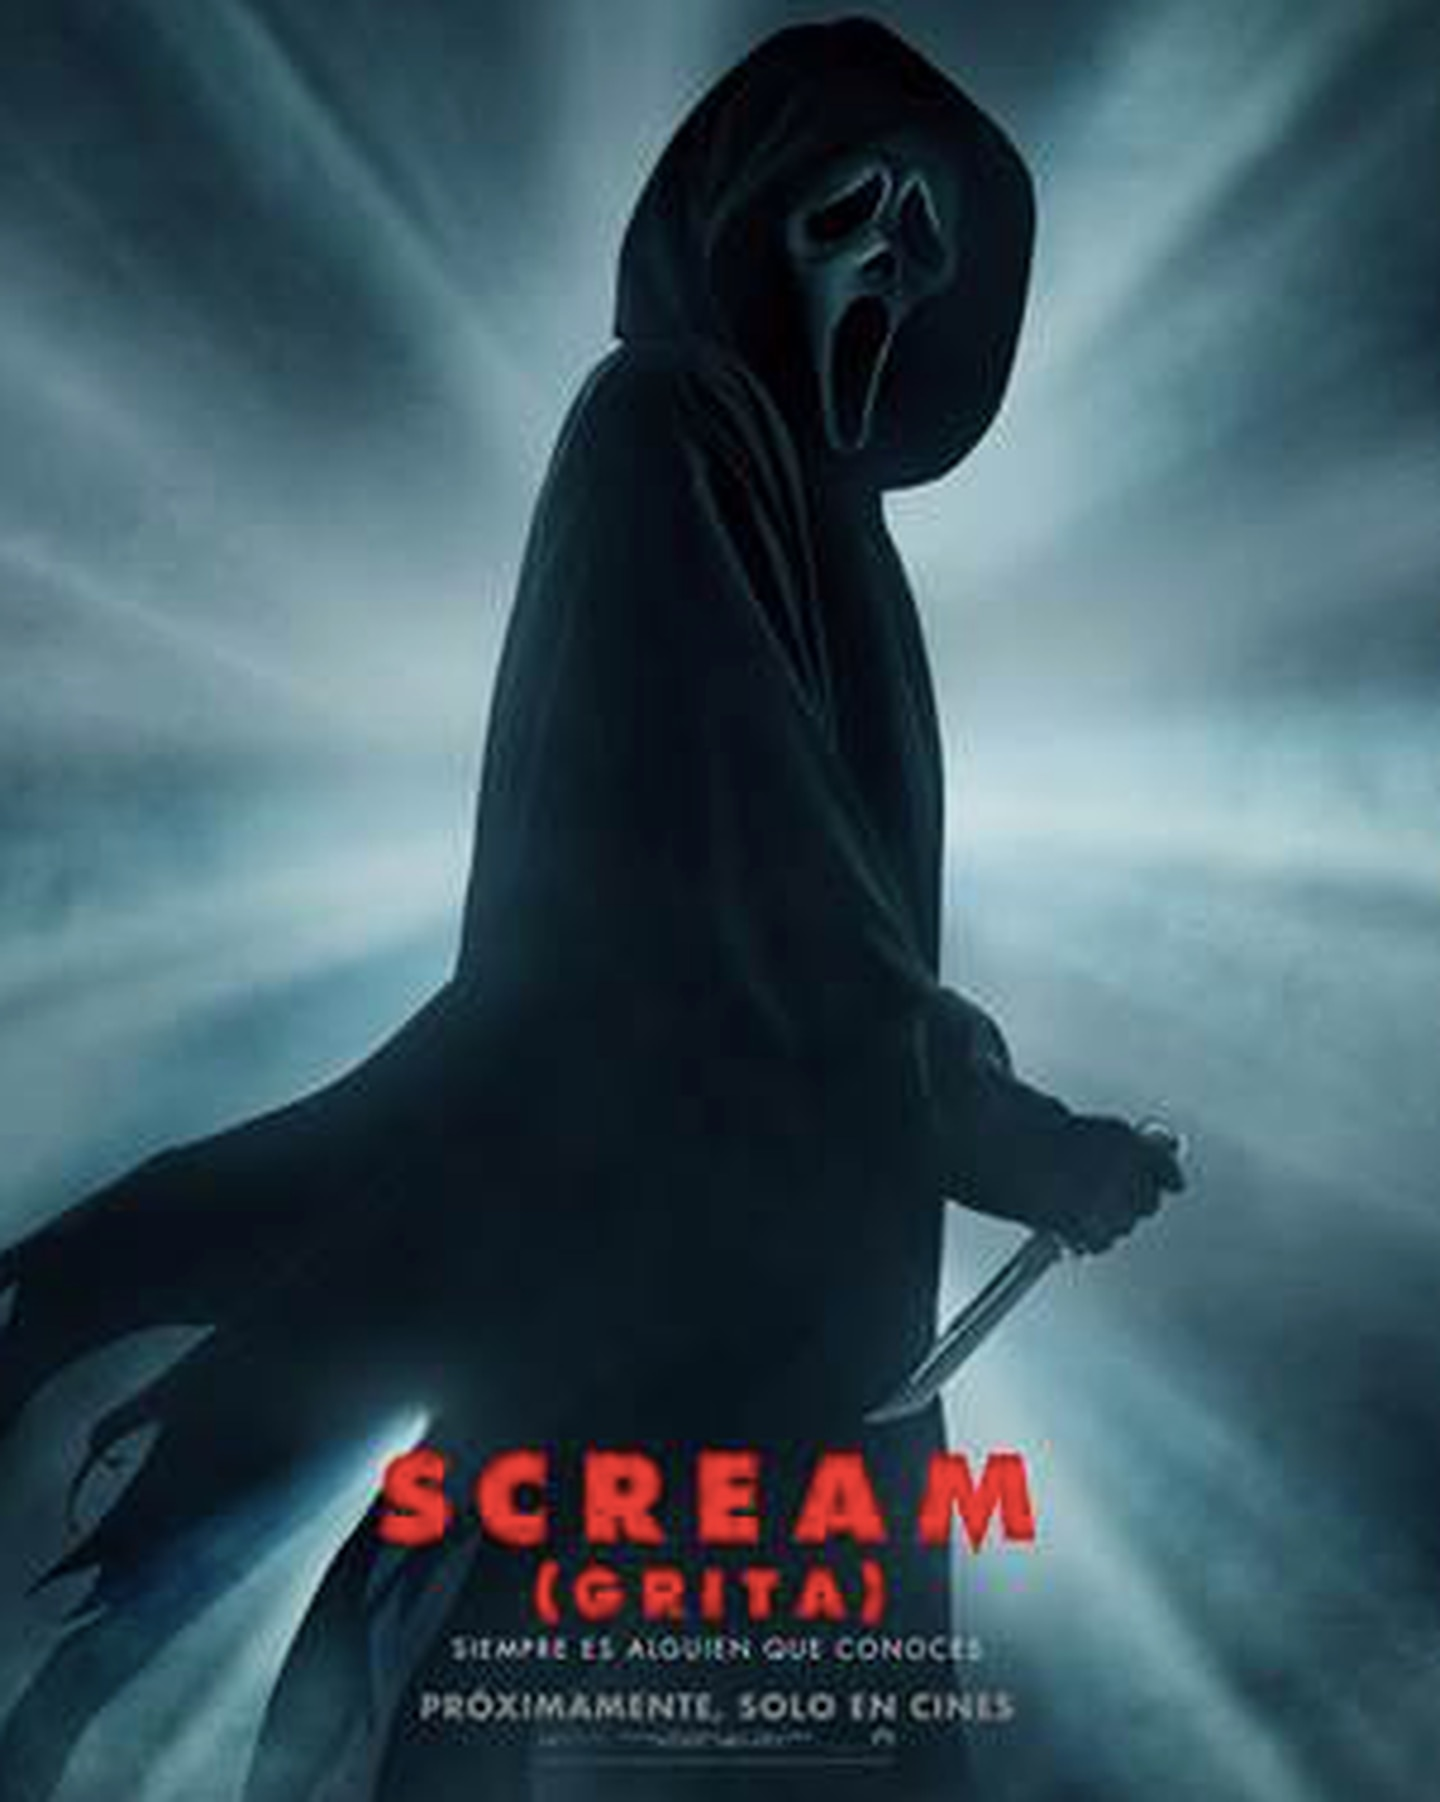 Scream, película 2022